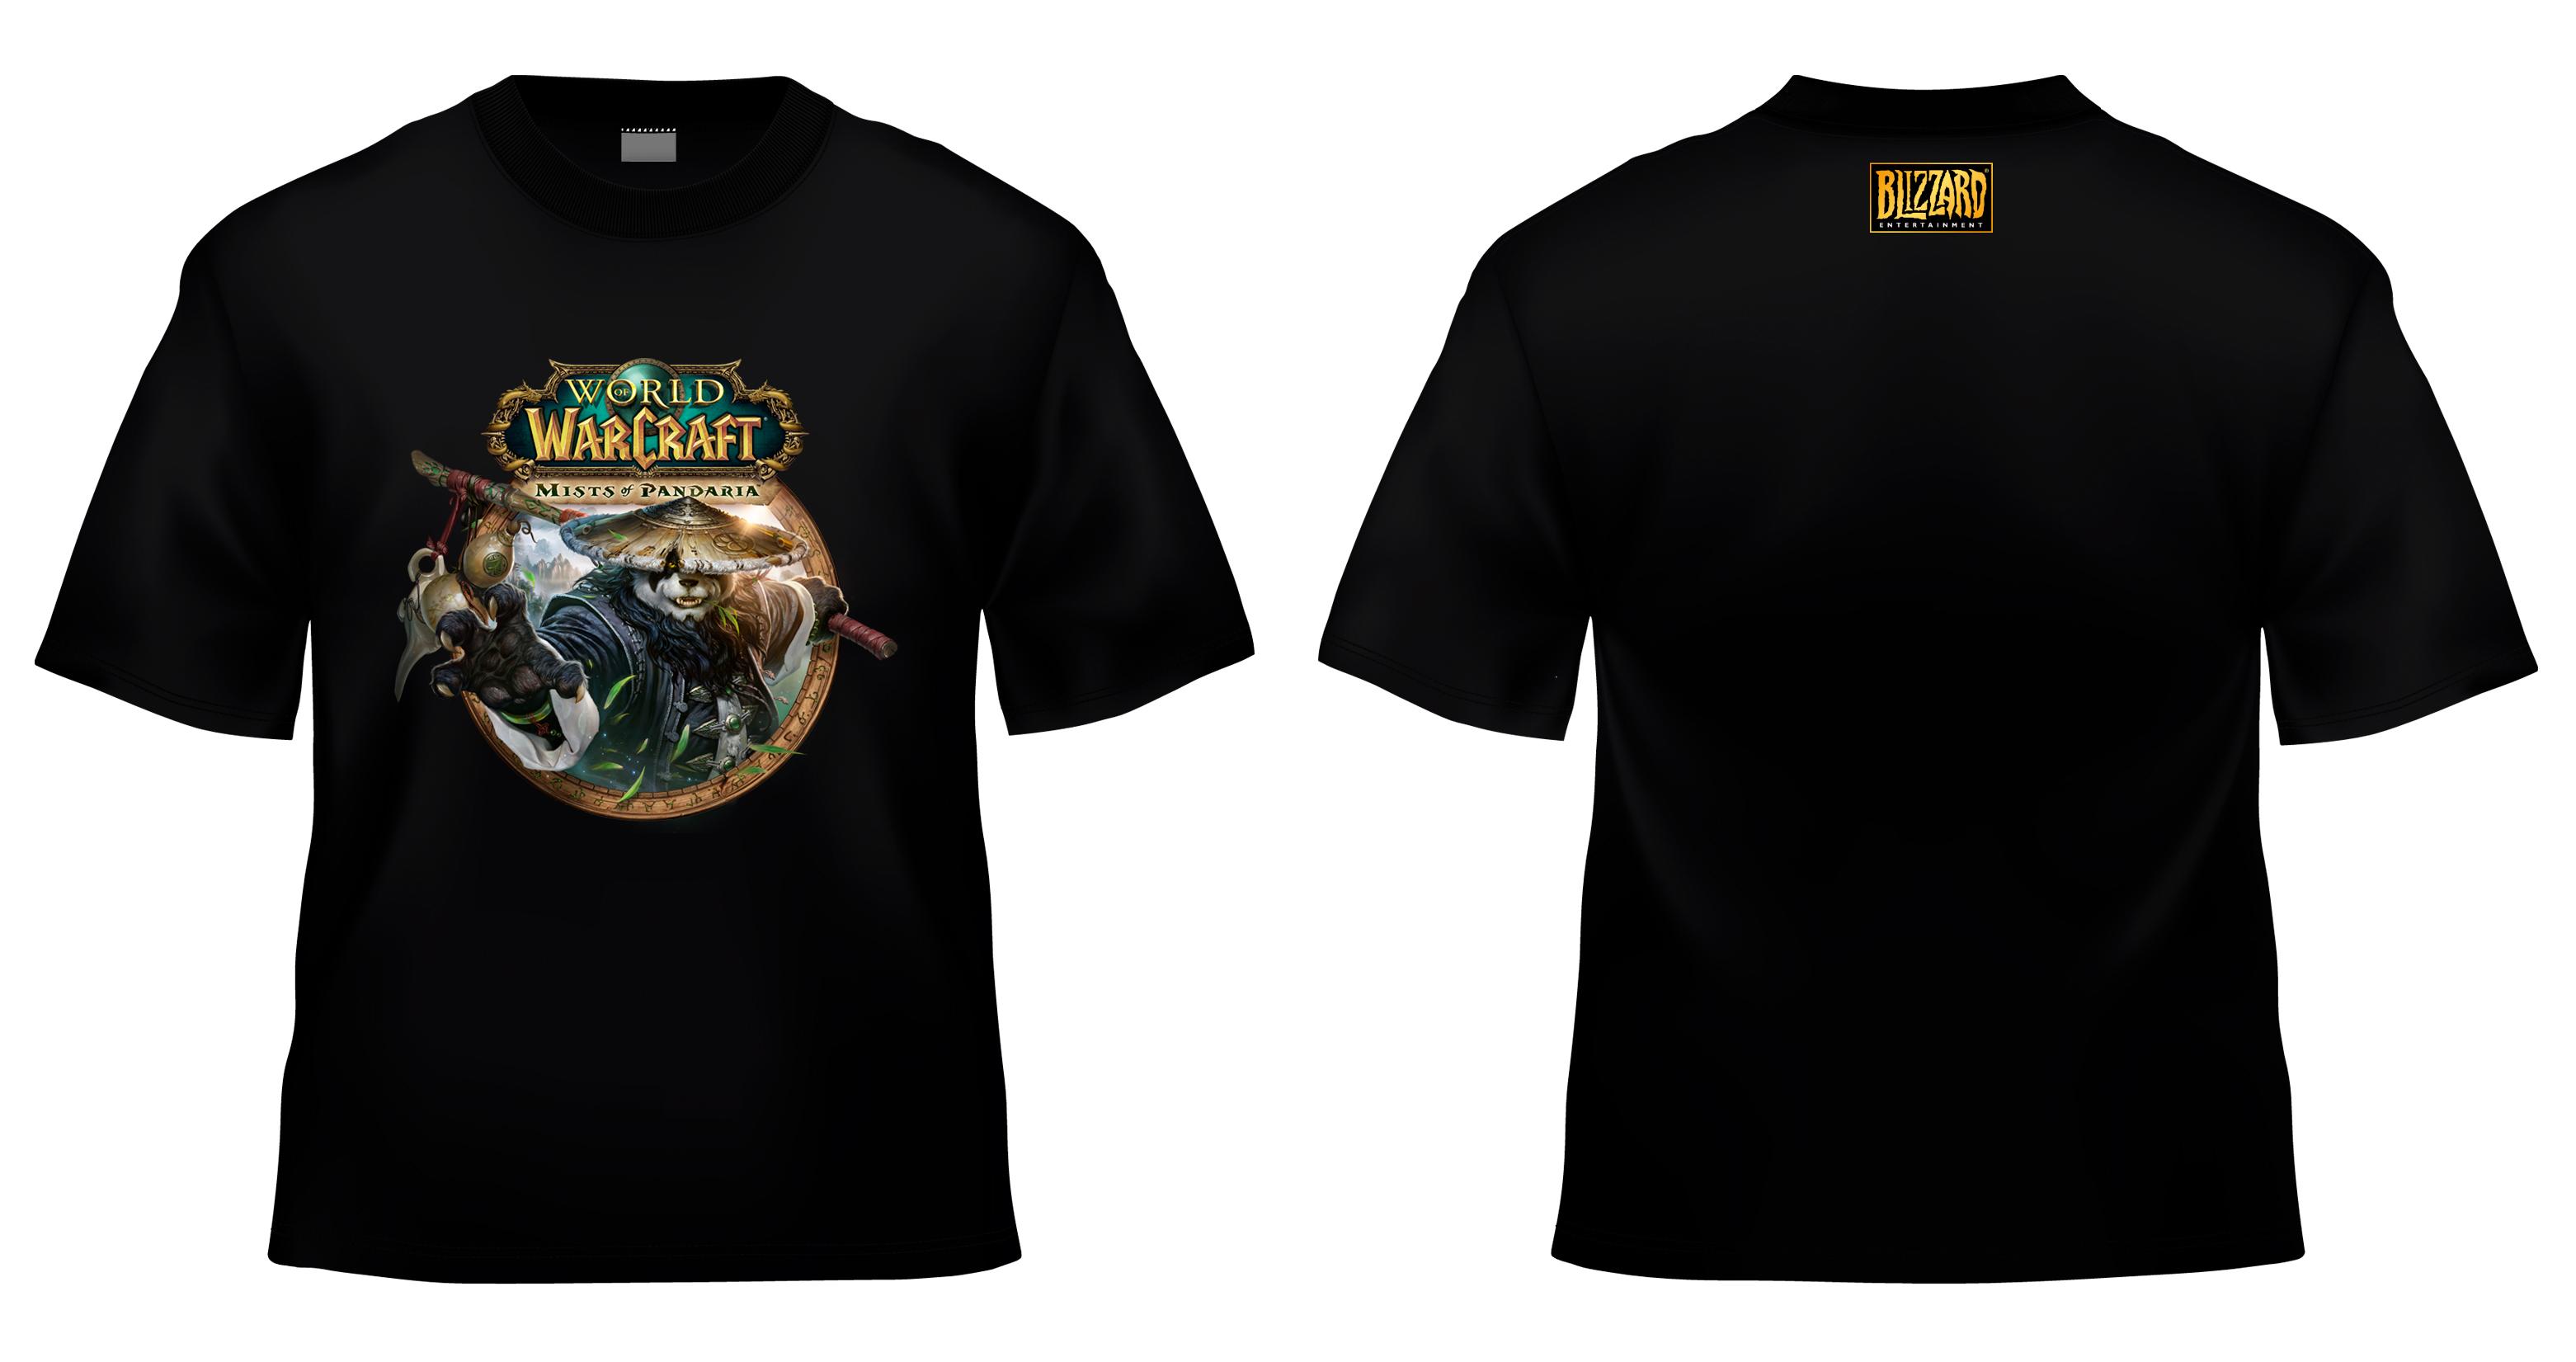 Tričko a plakát k World of Warcraft: Mists of Pandaria 69927